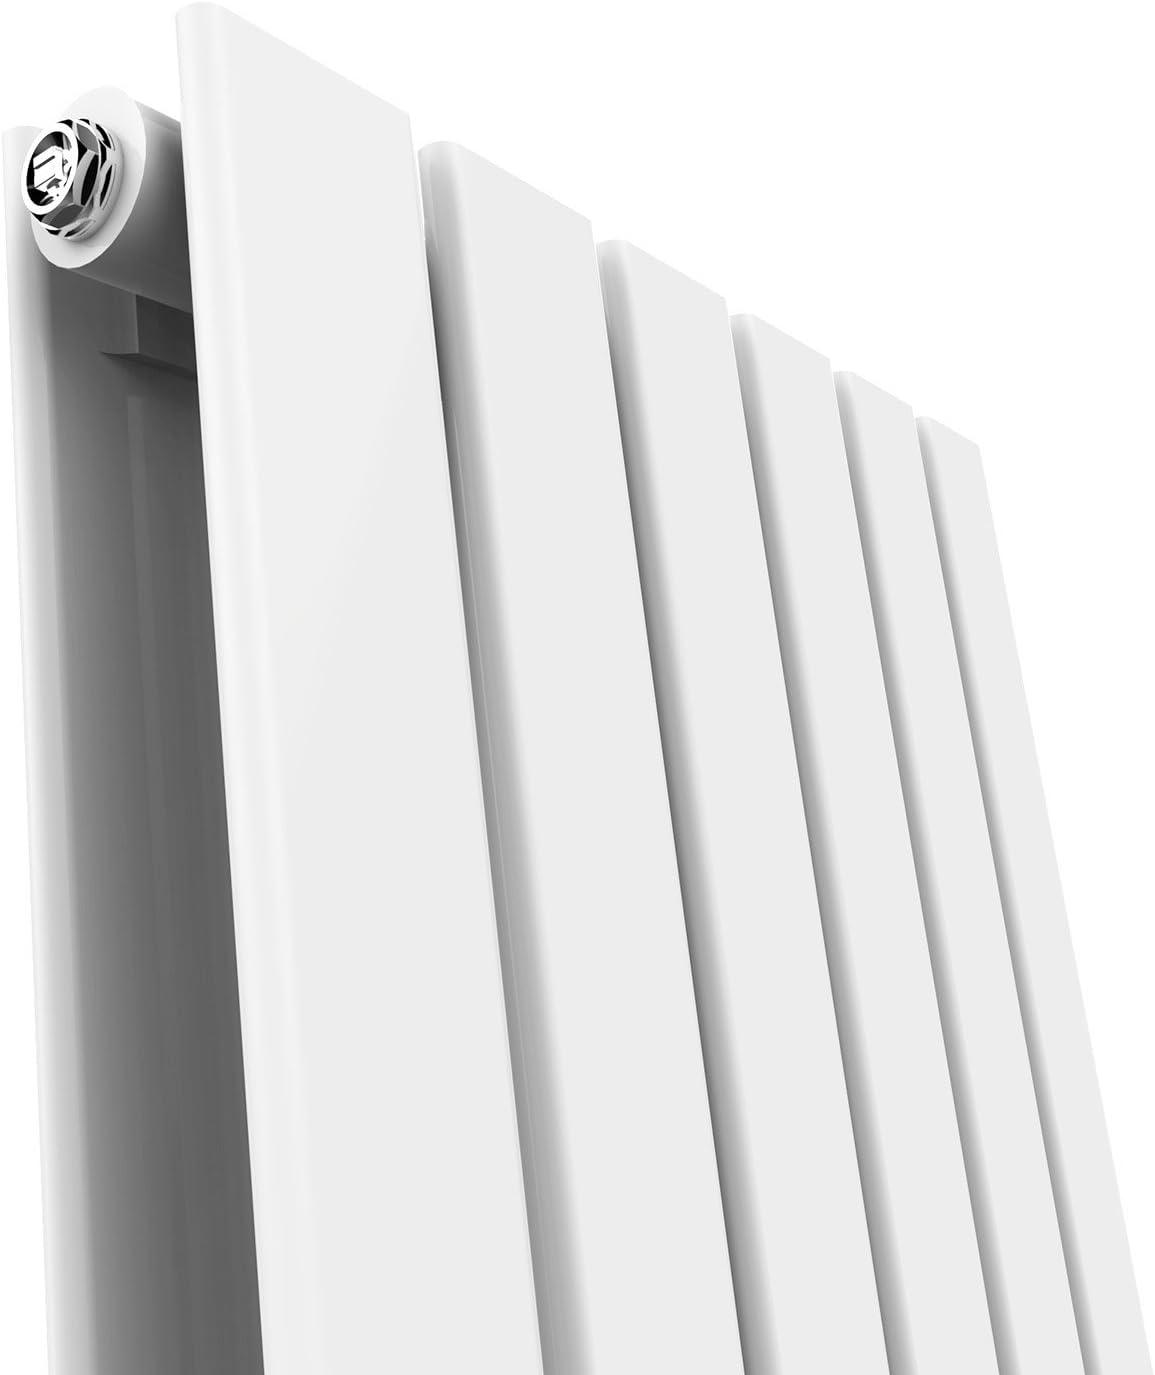 ELEGNT 600 x 600 mm Designer Horizontal Radiator White Double Flat Panel Bathroom Radiators Modern Panel Heaters